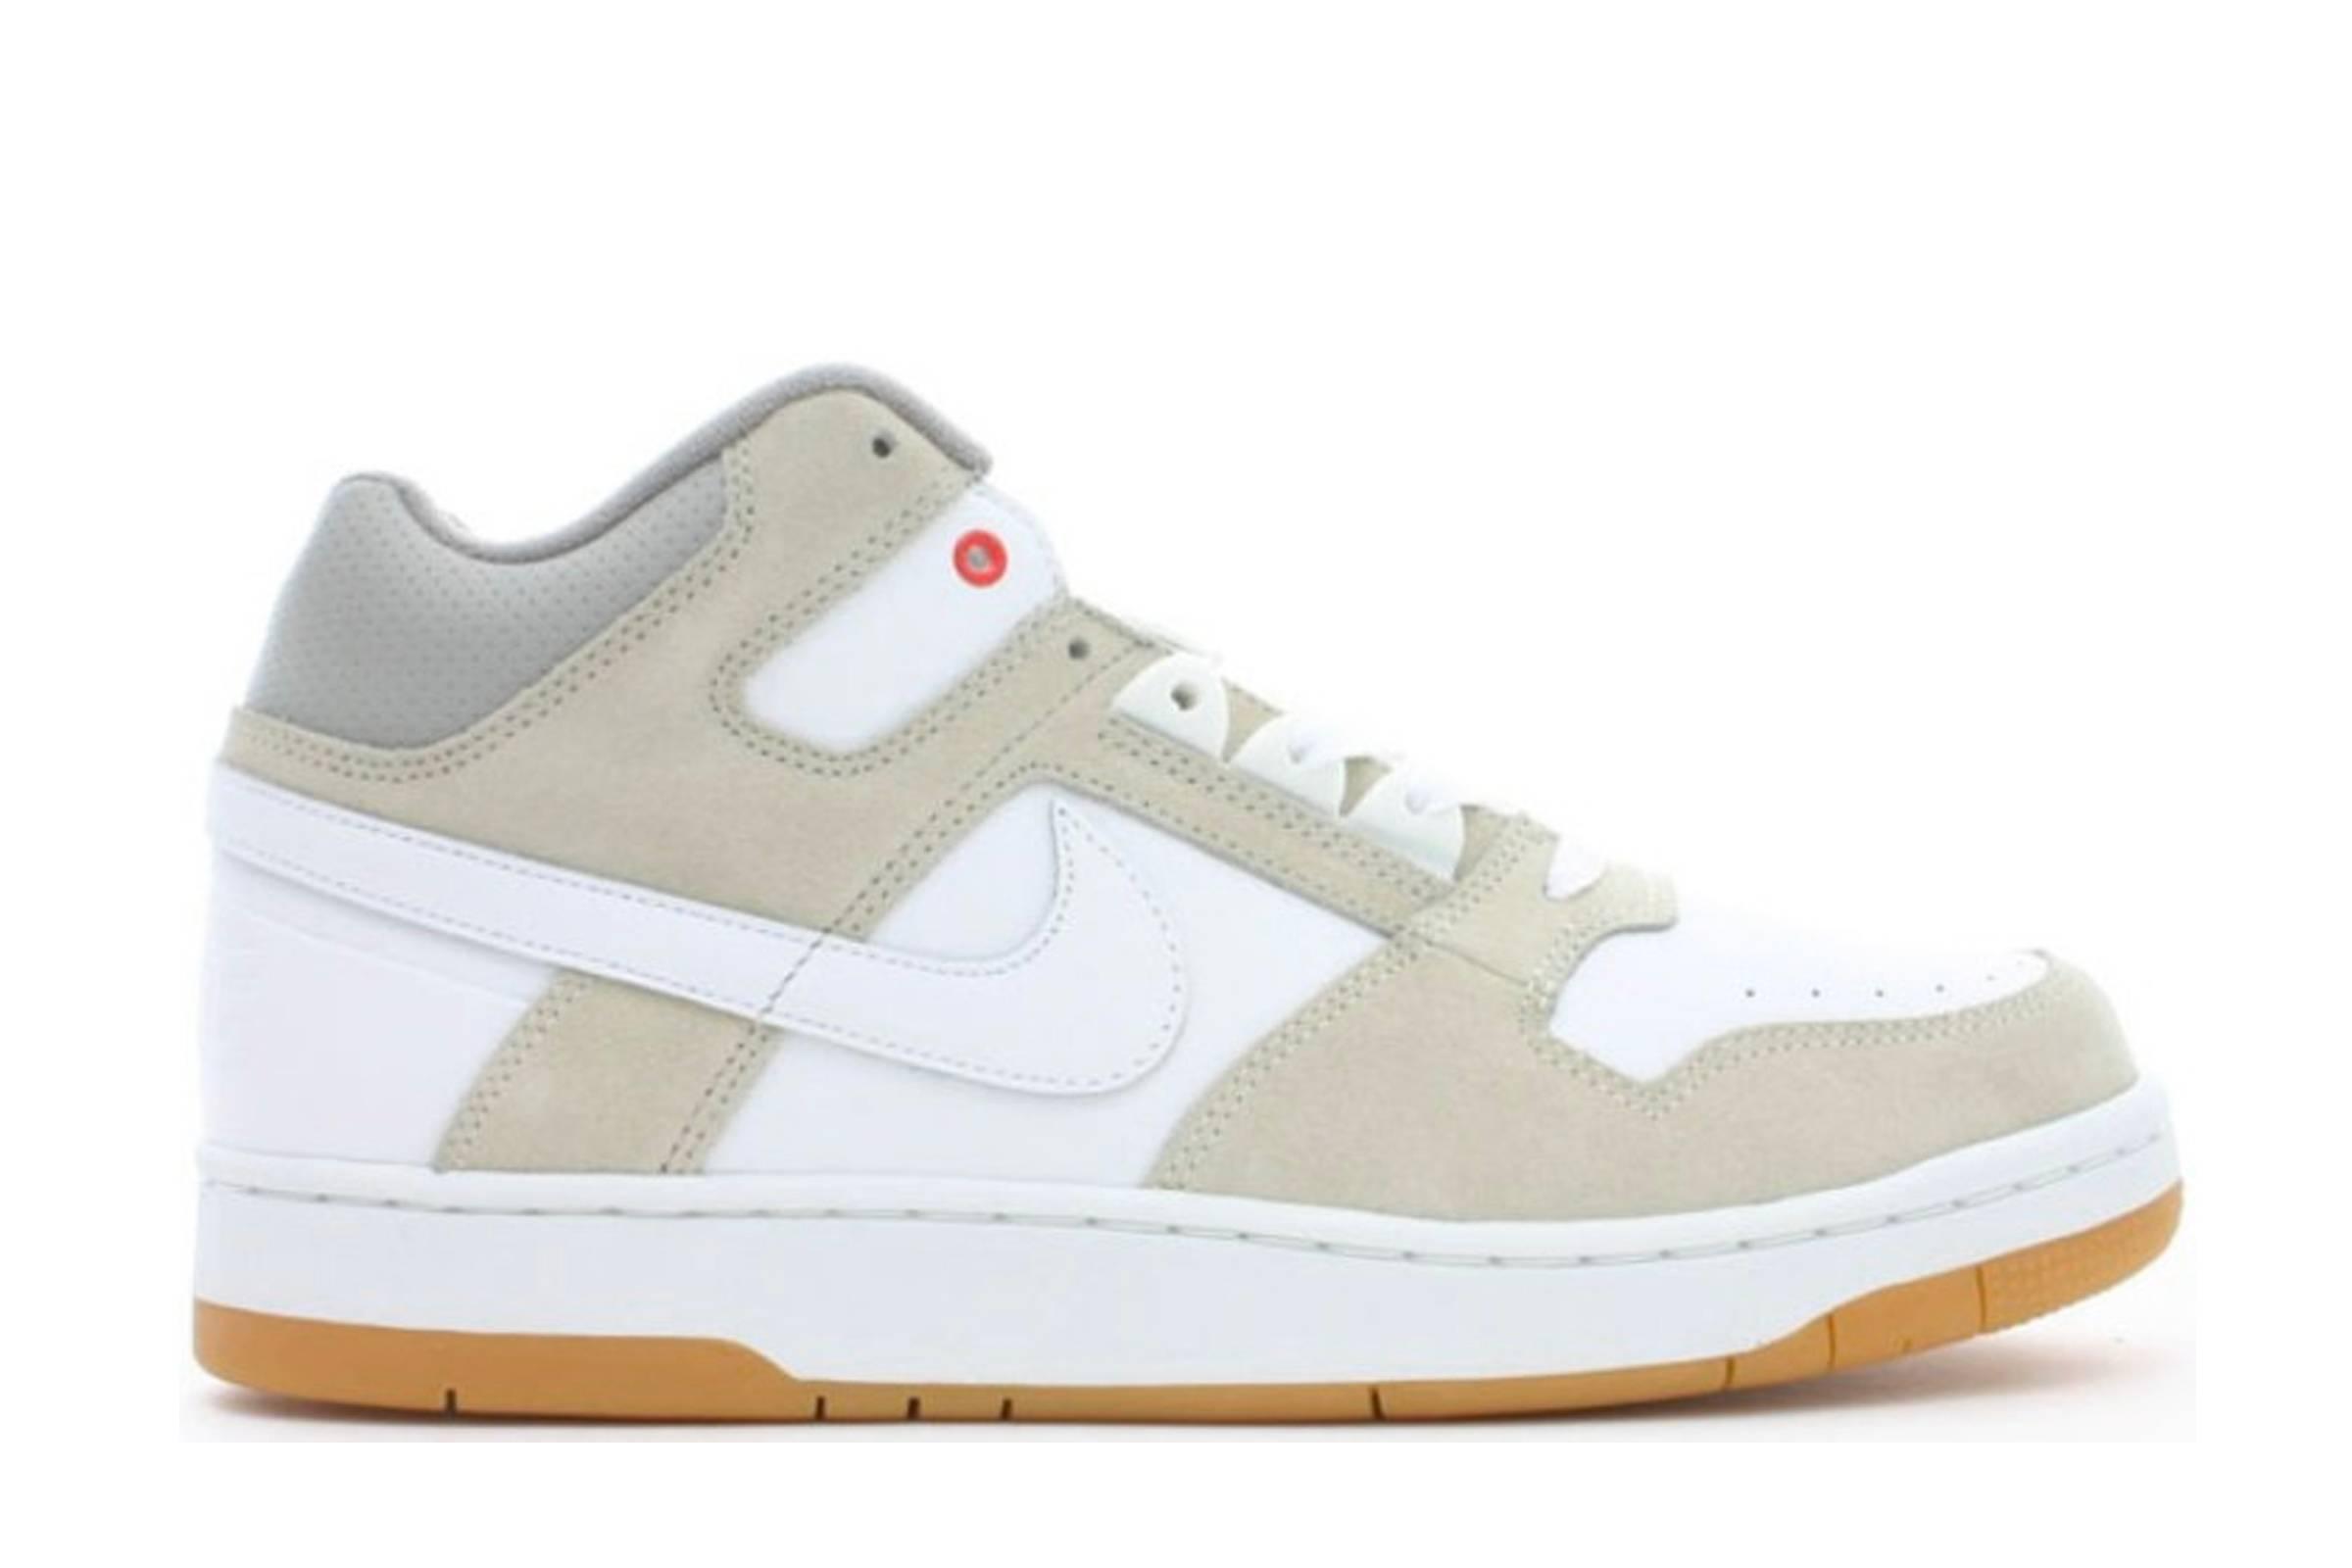 Supreme x Nike Delta Force ¾ SB (2004)